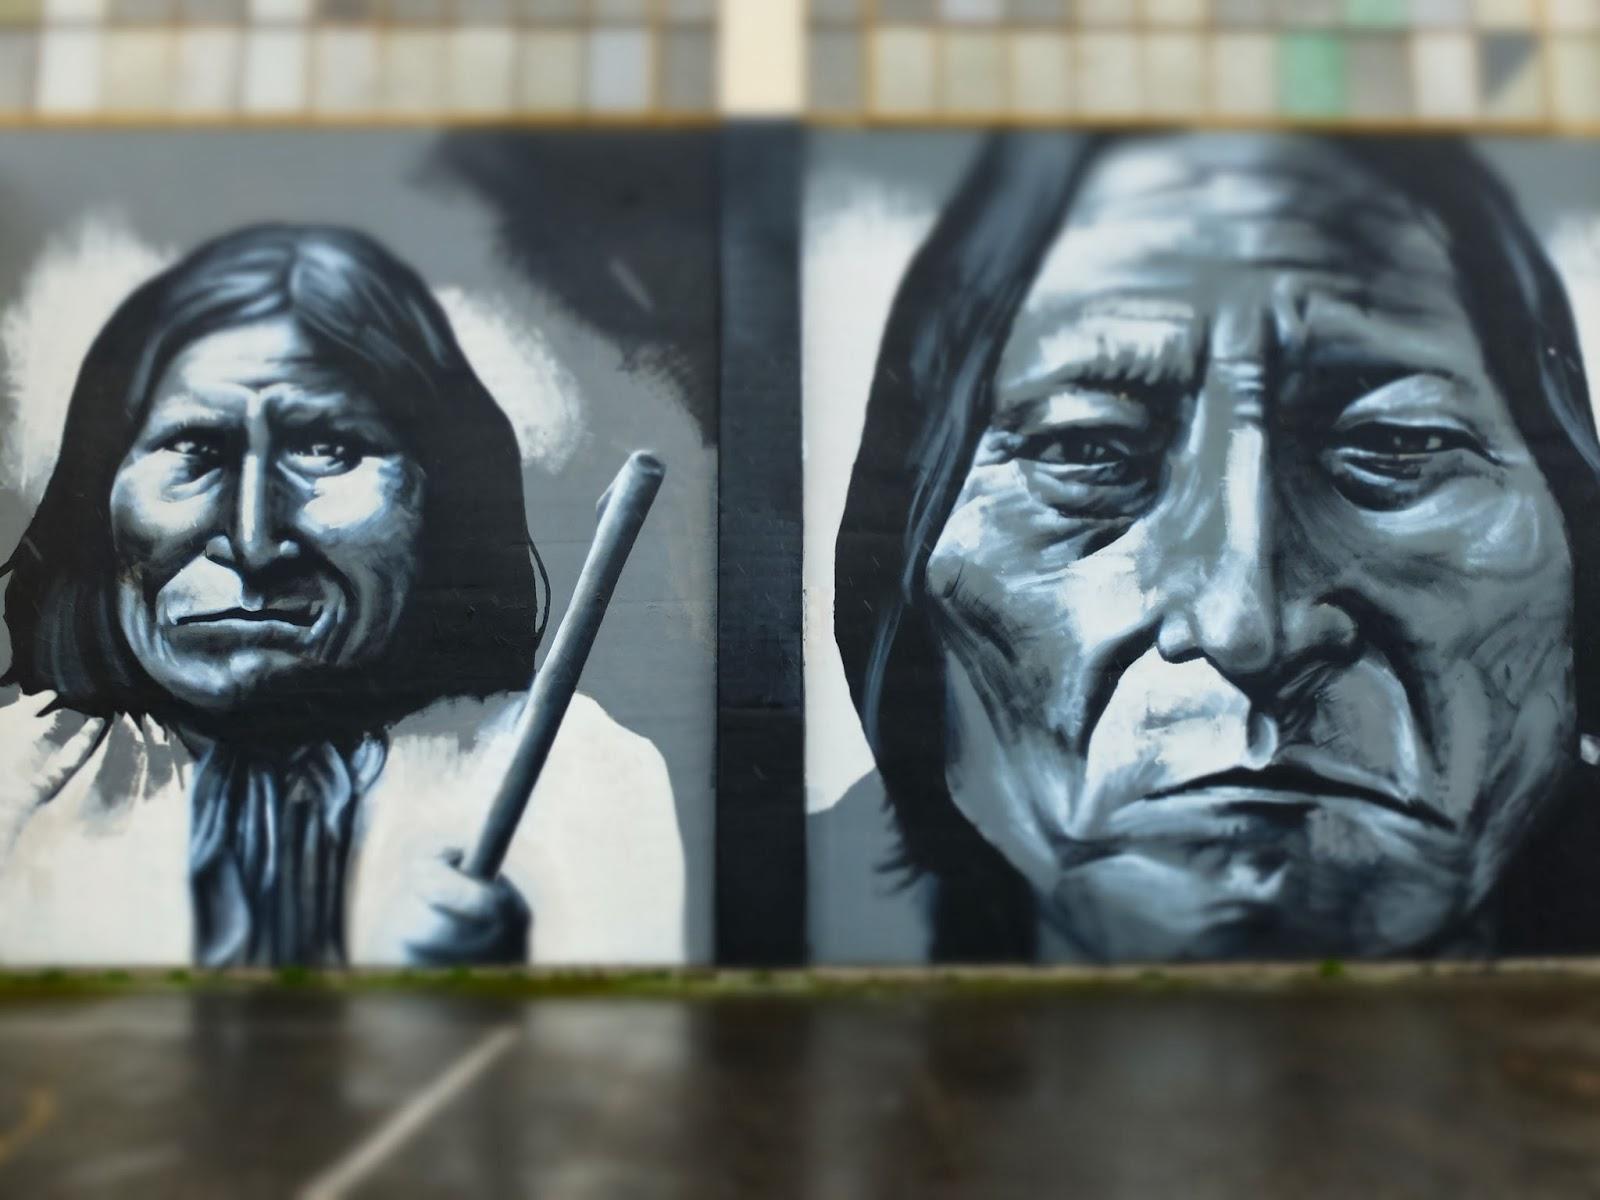 Geronimo and Bitting Bull street art